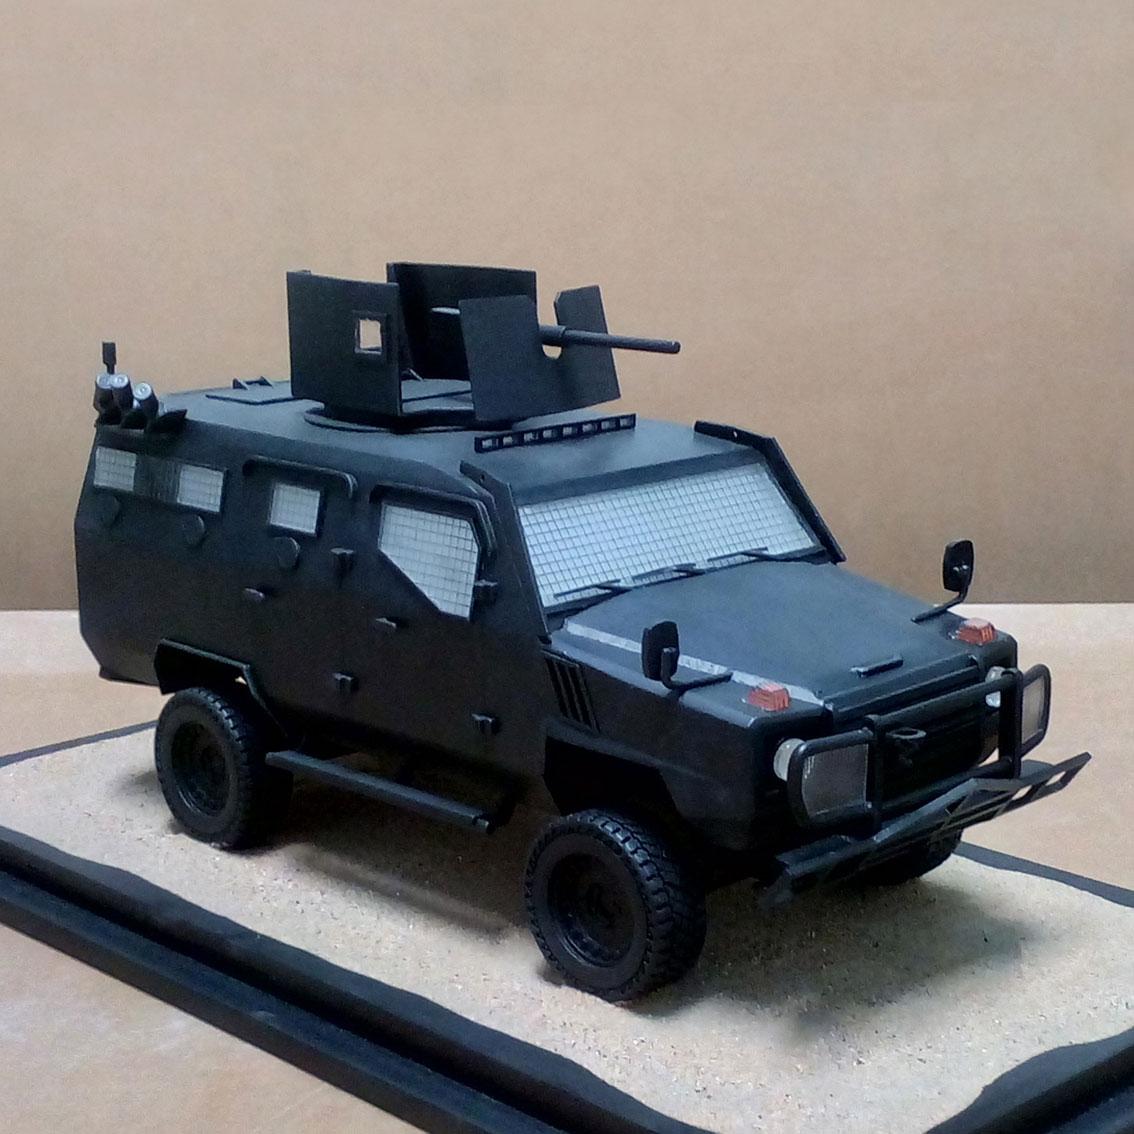 Scale Model - Vehicles - MMV STEYR